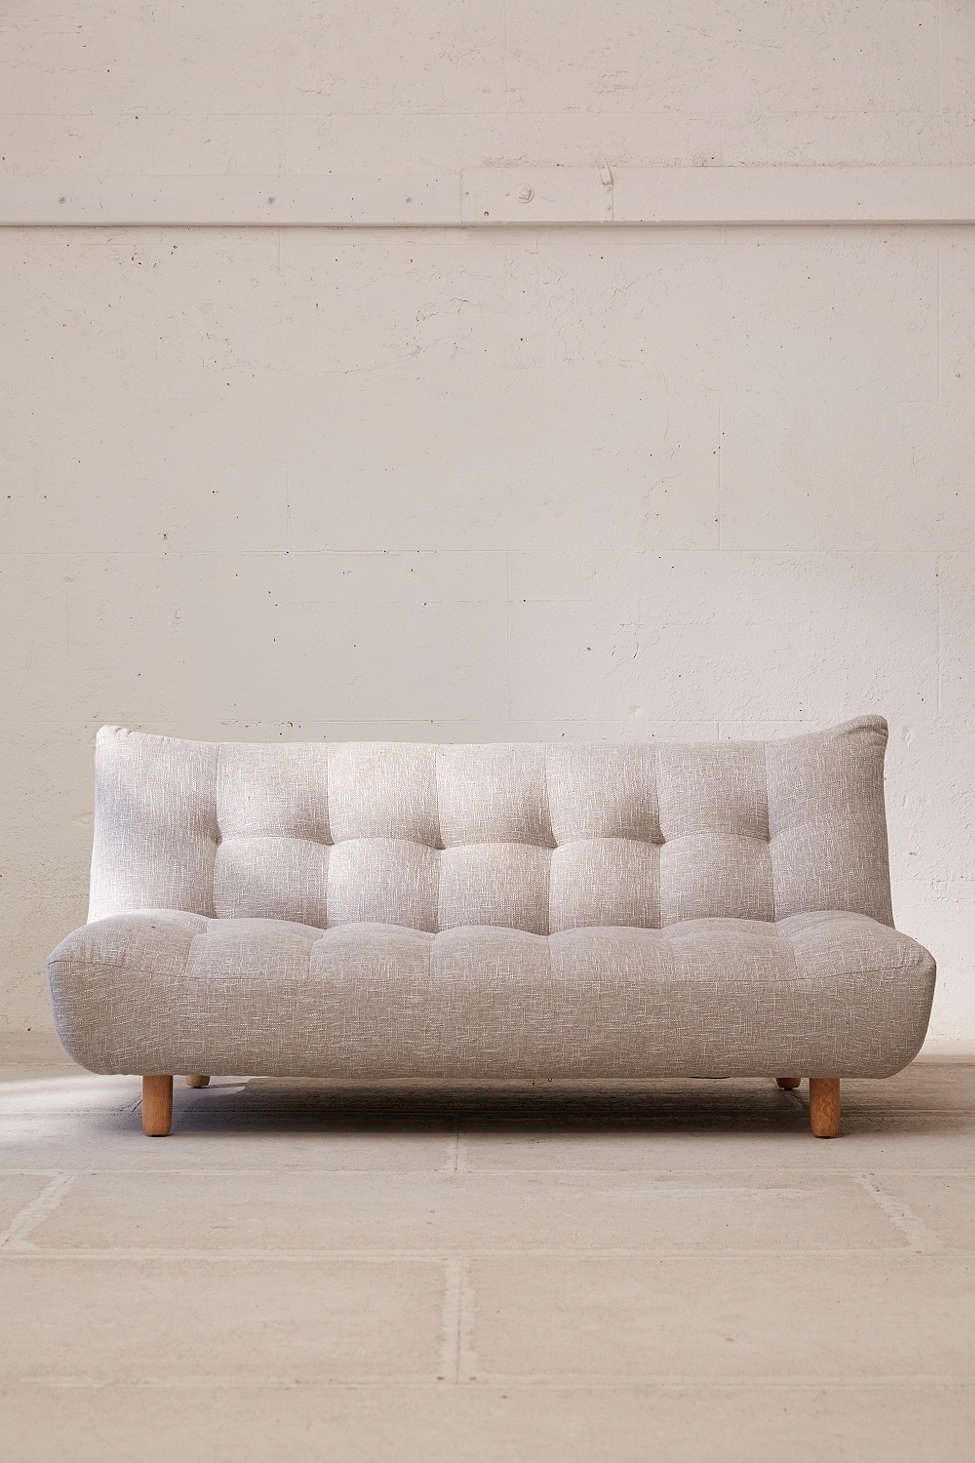 Winslow Armless Sleeper Sofa | Sleeper Sofas, Studio Apartment And For Small Armless Sofas (Image 10 of 10)